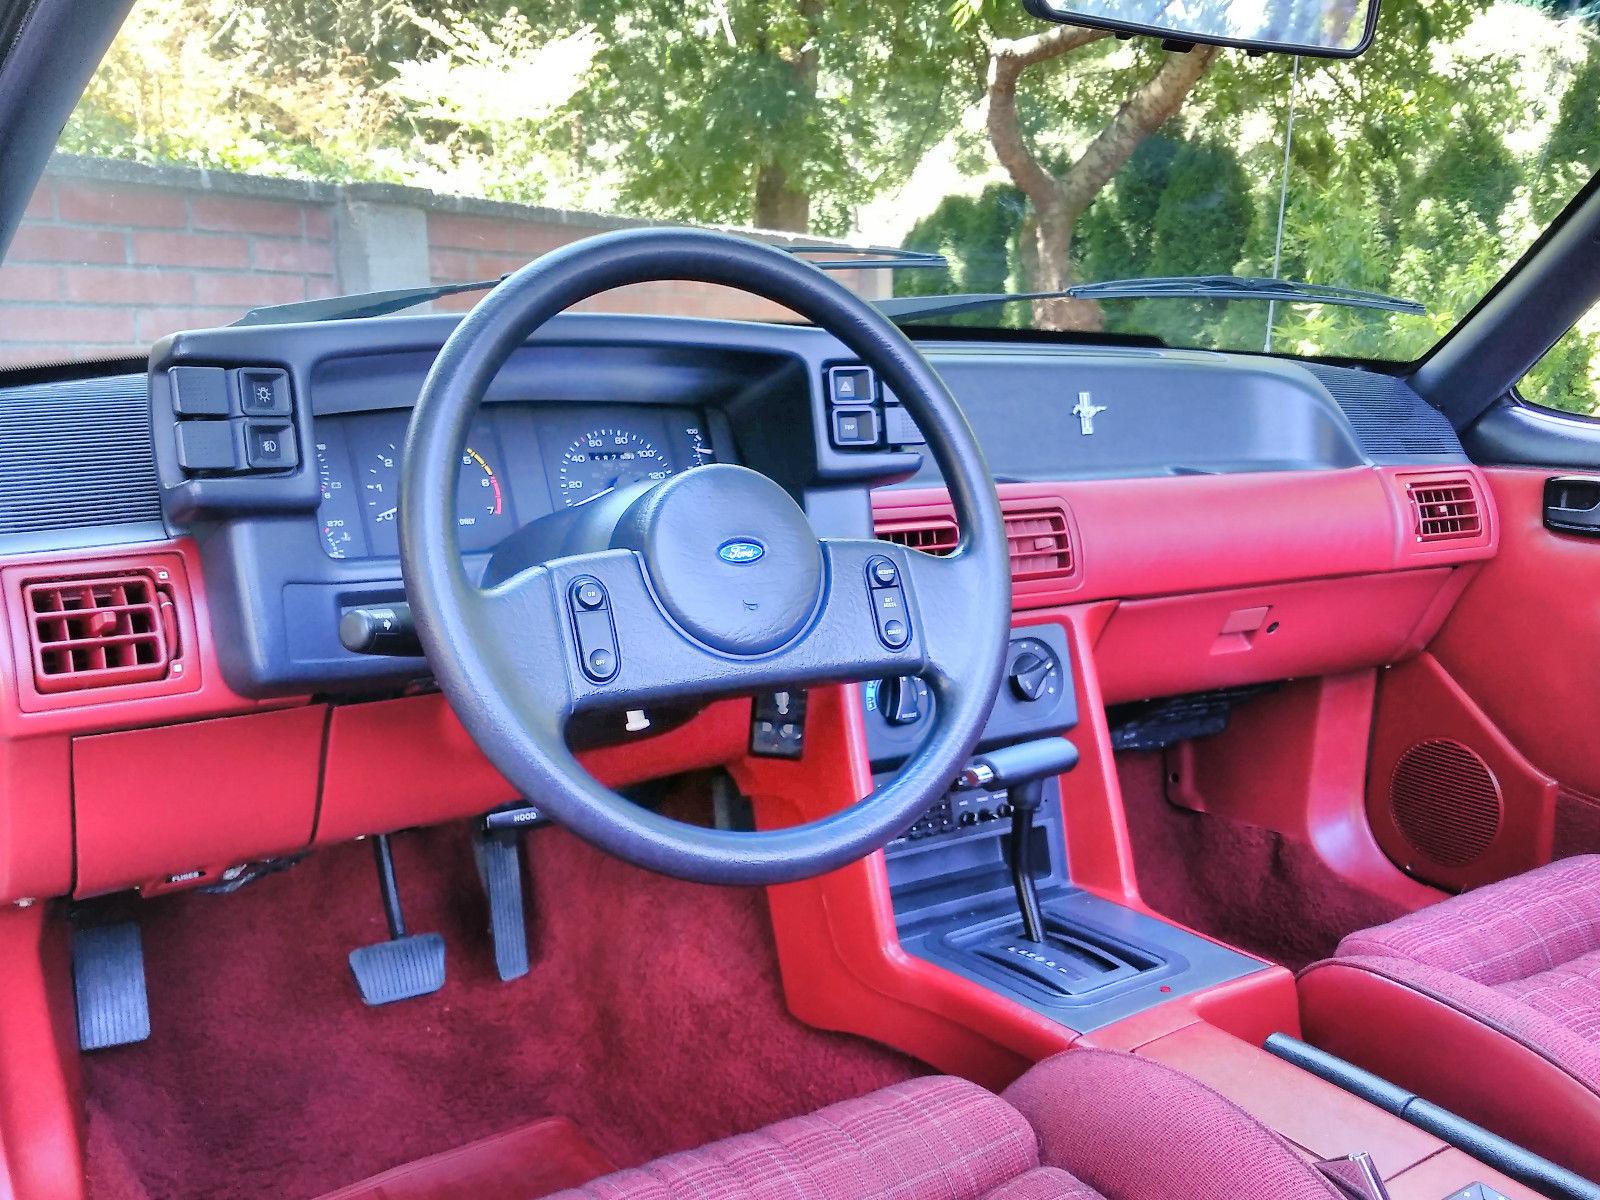 1989 Ford Mustang Cobra Gt Mustang Convertible 5 0 V8